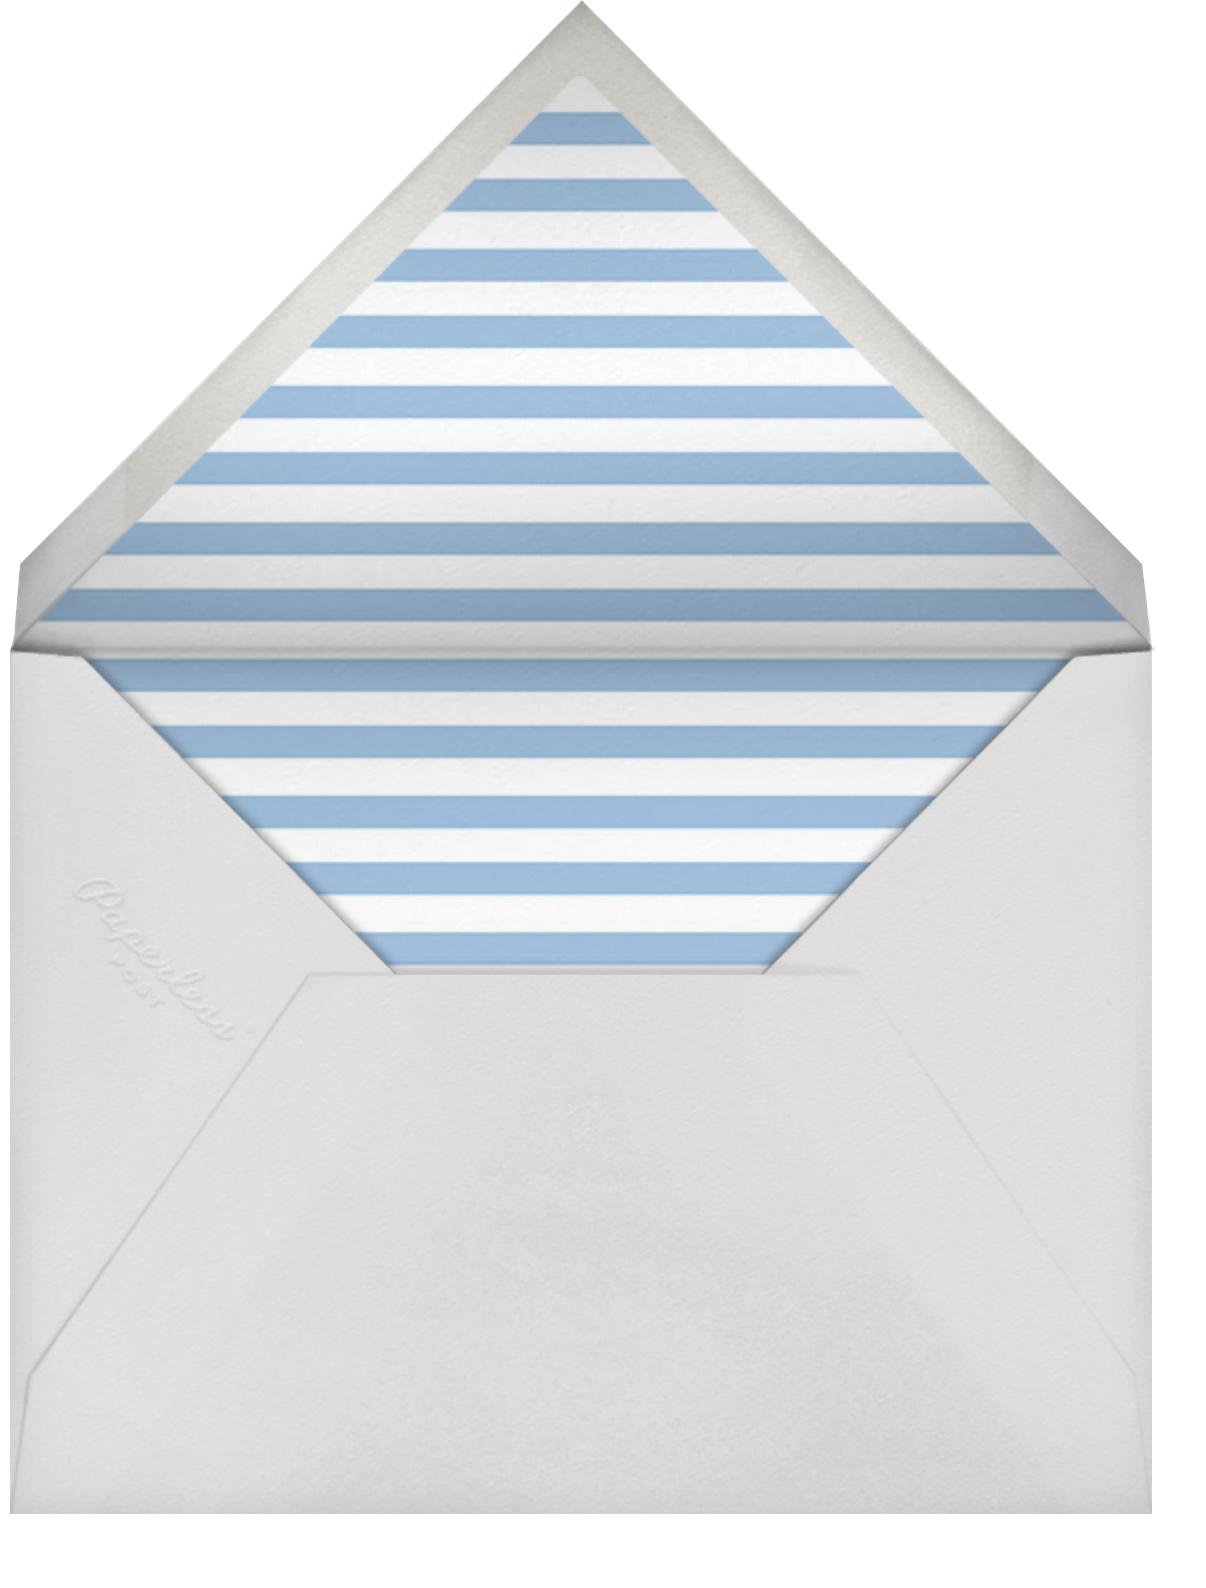 Plume (Tall) - White/Gold - Paperless Post - All - envelope back